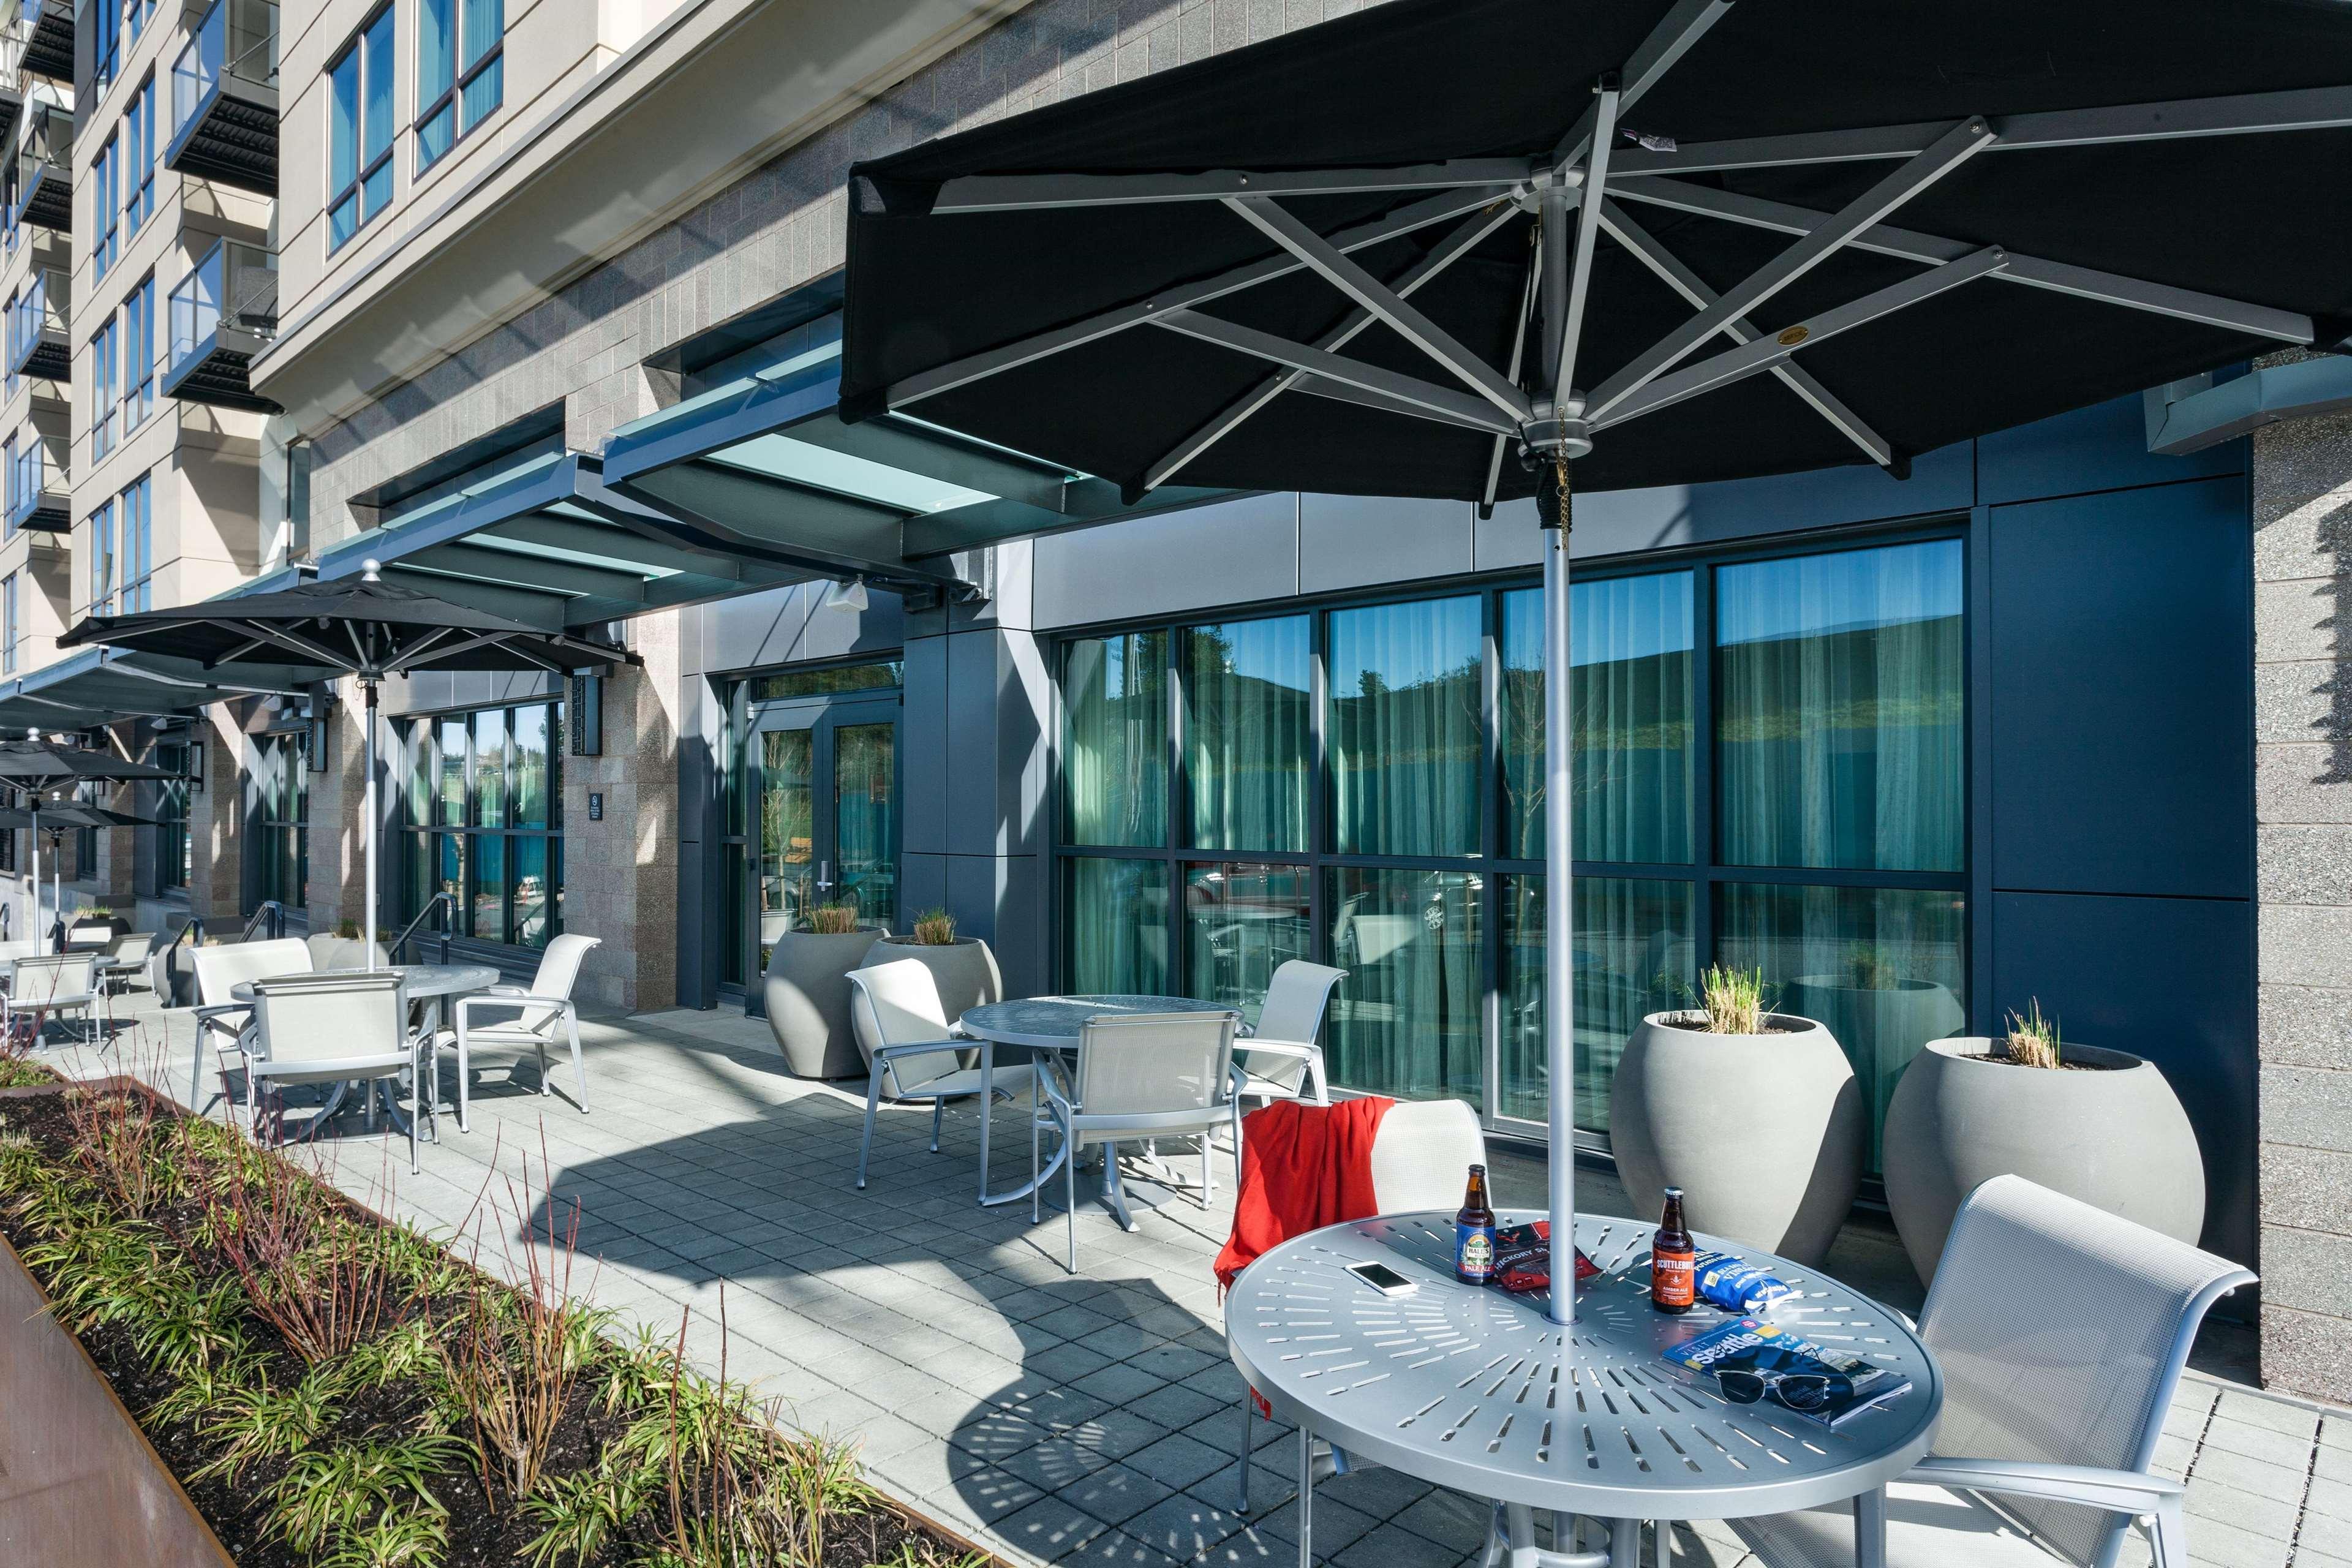 Hampton Inn & Suites by Hilton Seattle/Northgate image 20